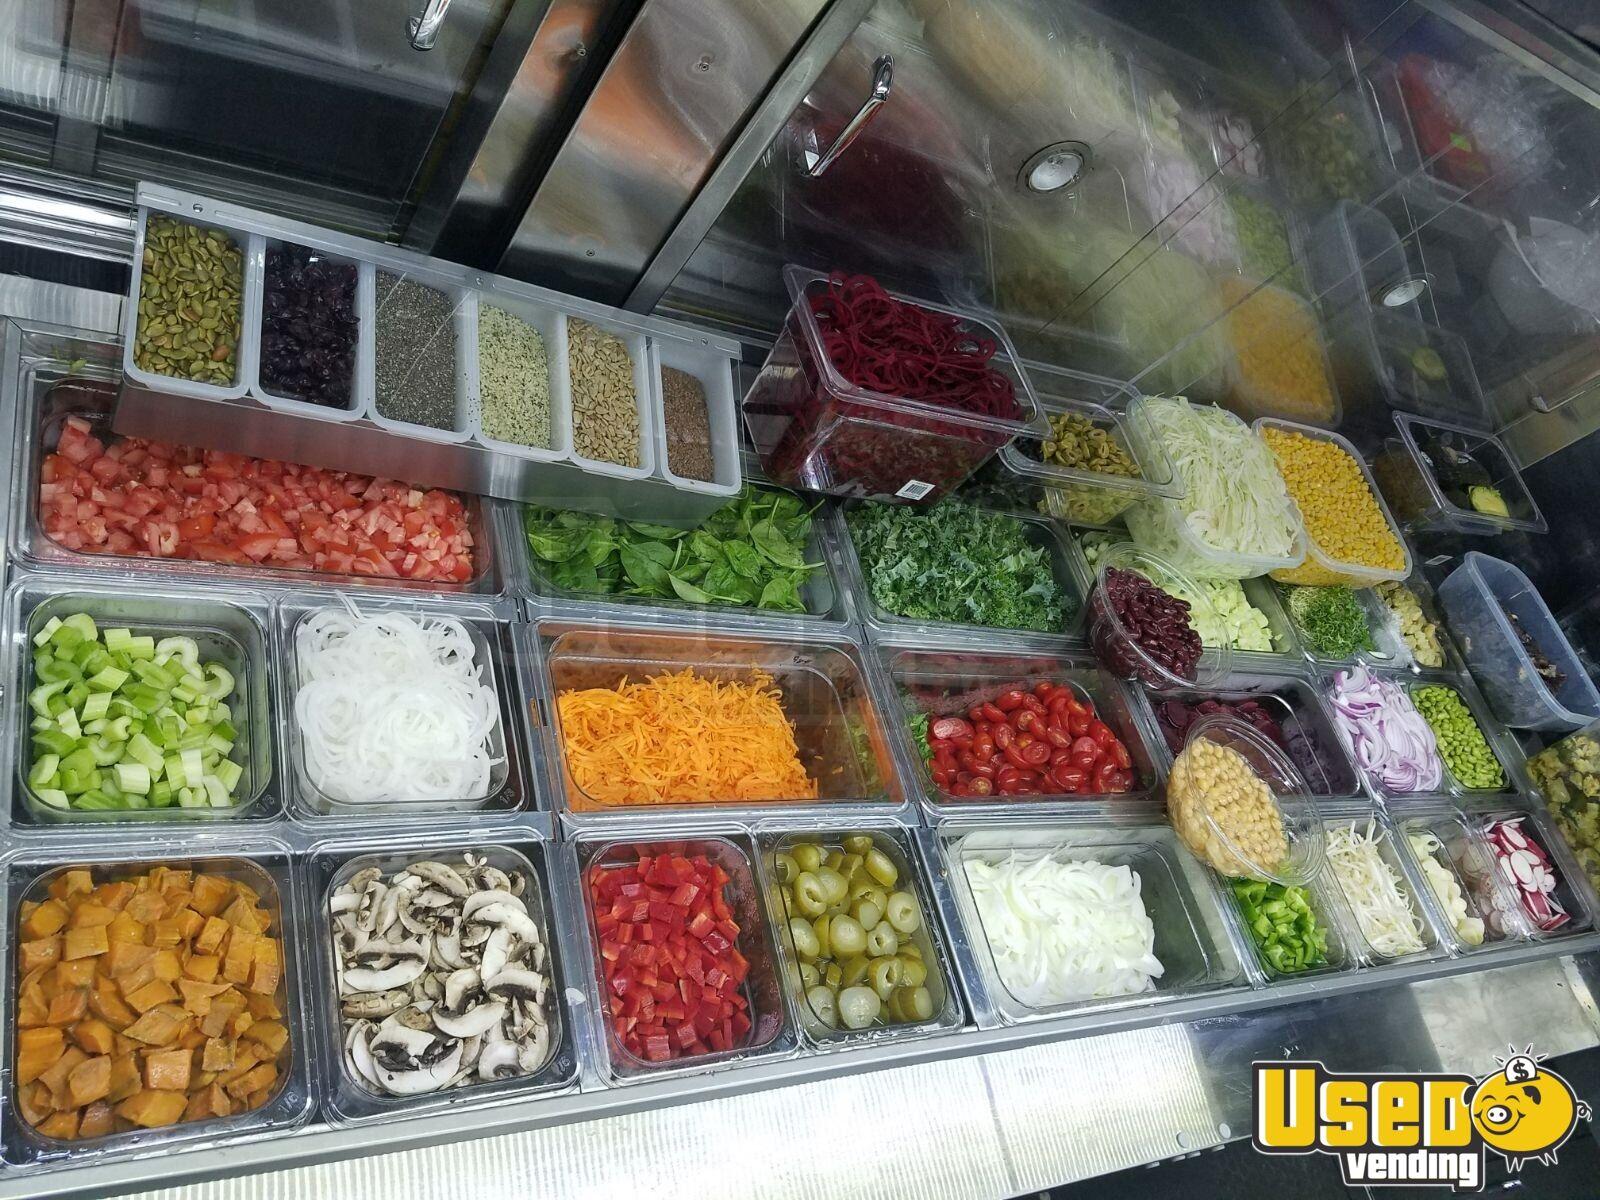 Used Food Truck For Sale >> Freightliner Food Truck | Used Food Truck for Sale in New York